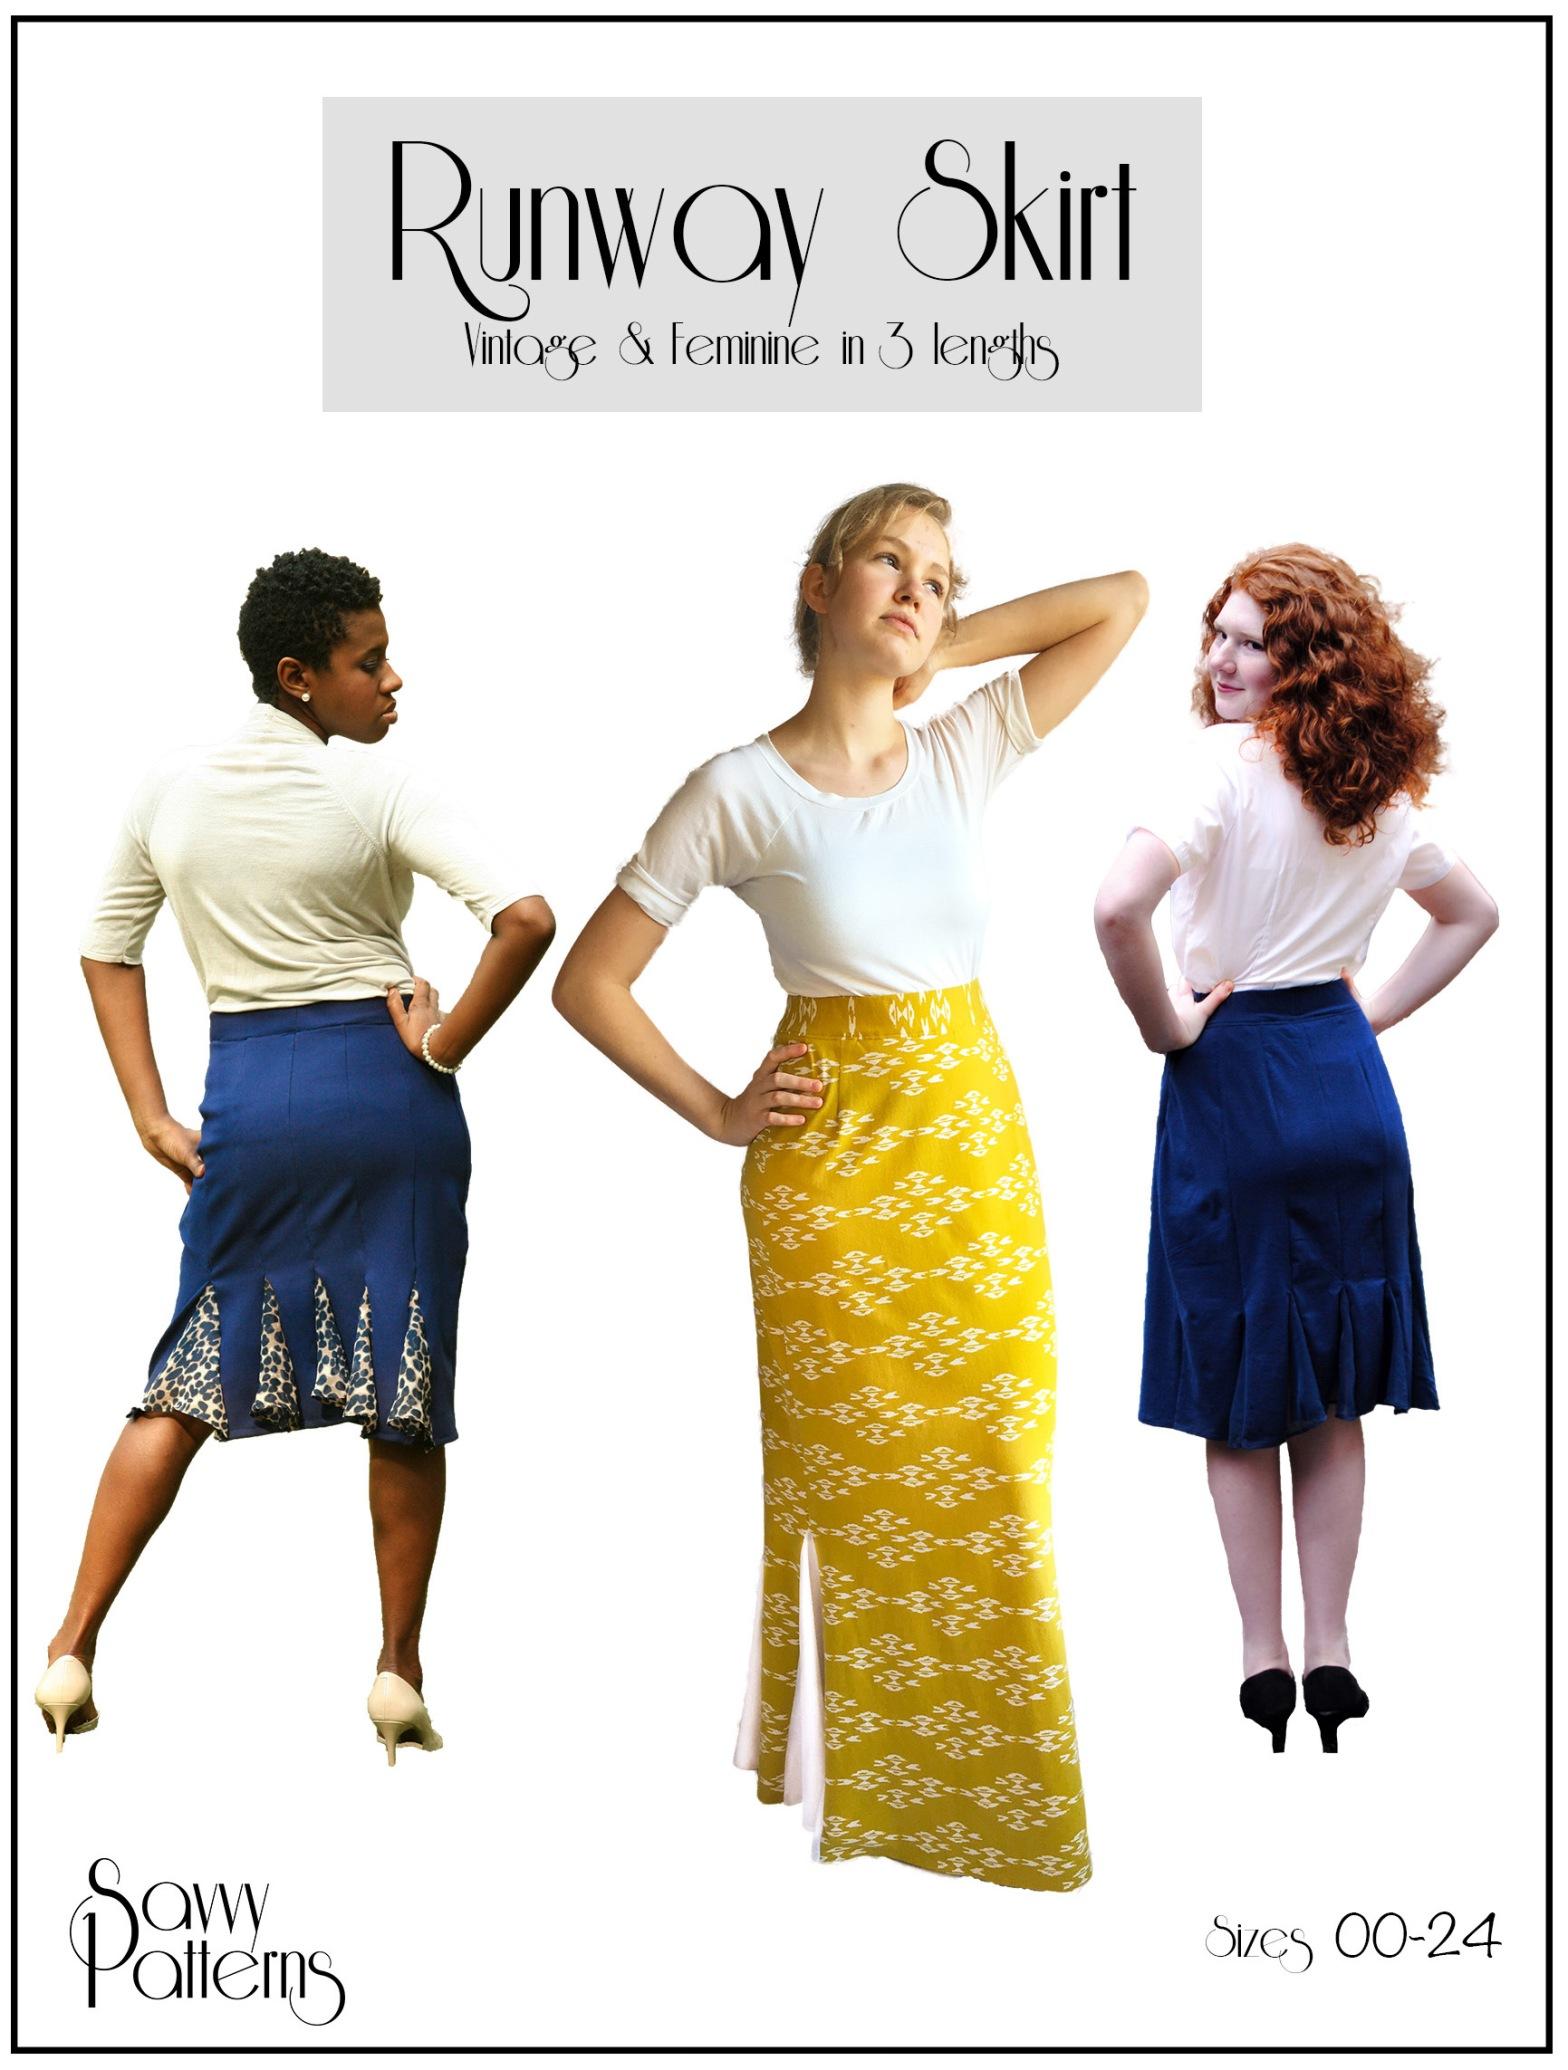 The Runway Skirt pattern